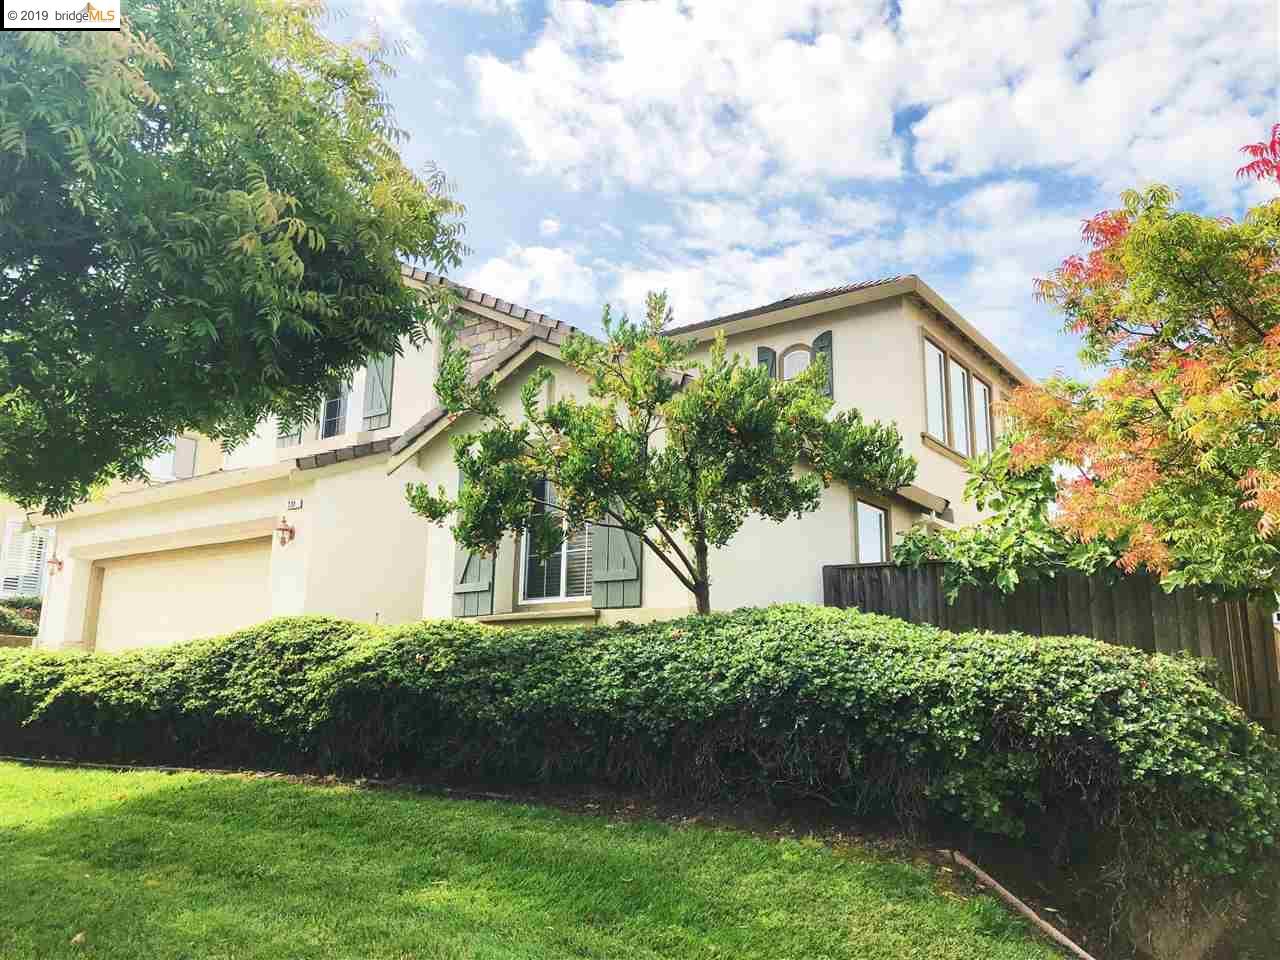 230 TANGLEWOOD DR, RICHMOND, CA 94806